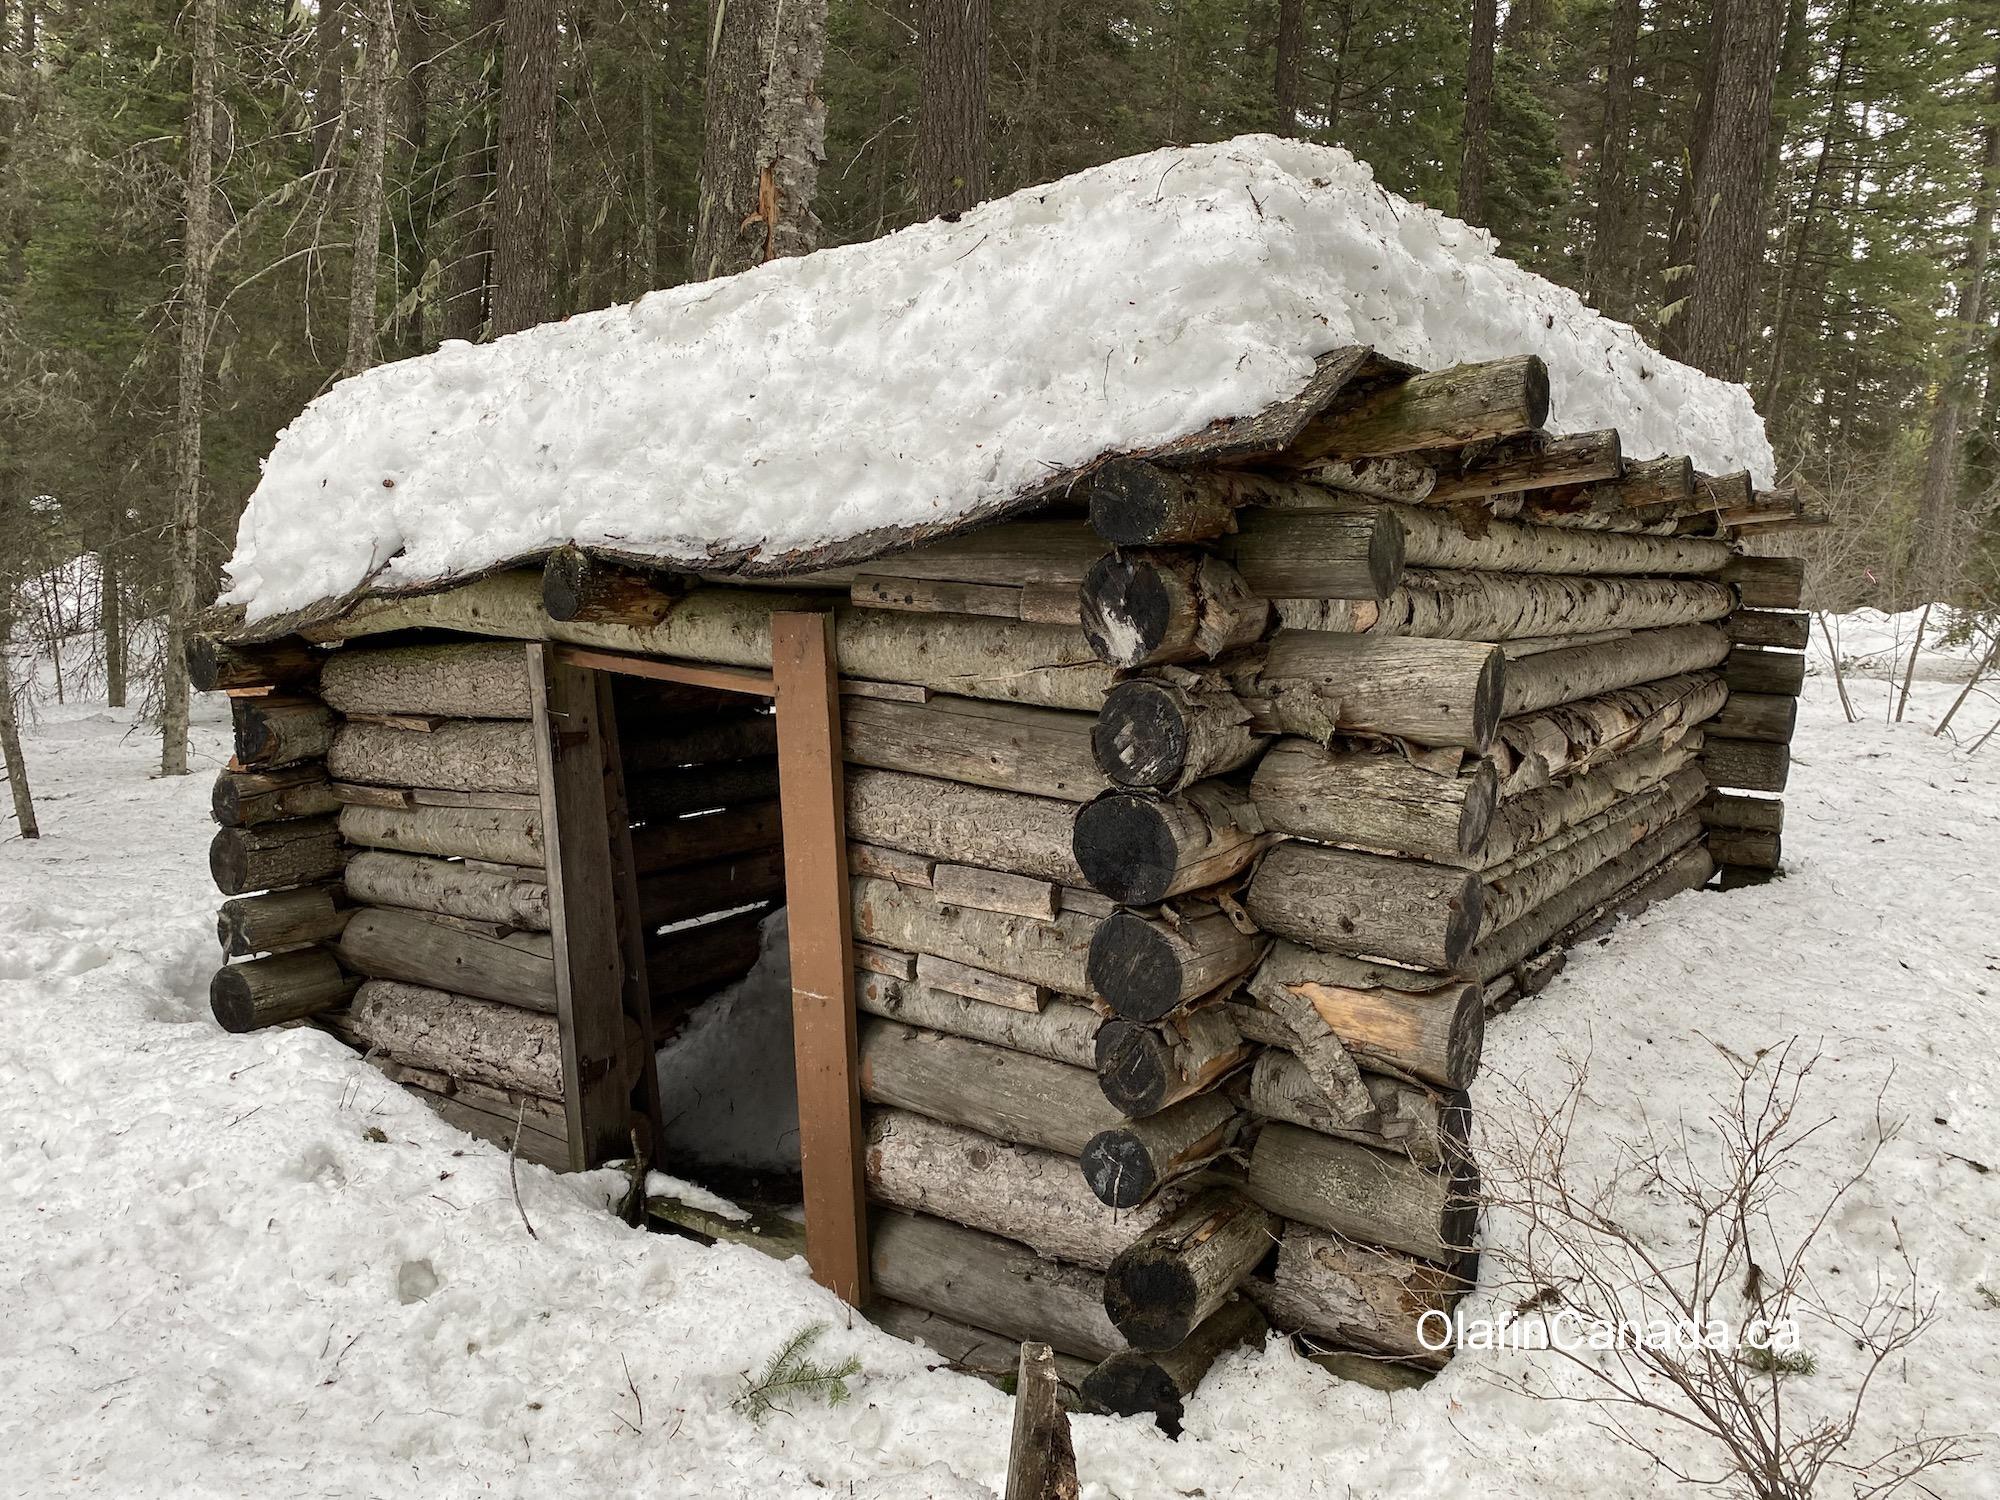 Old log cabin in the woods near West Kelowna #olafincanada #britishcolumbia #discoverbc #abandonedbc #westkelowna #cabin